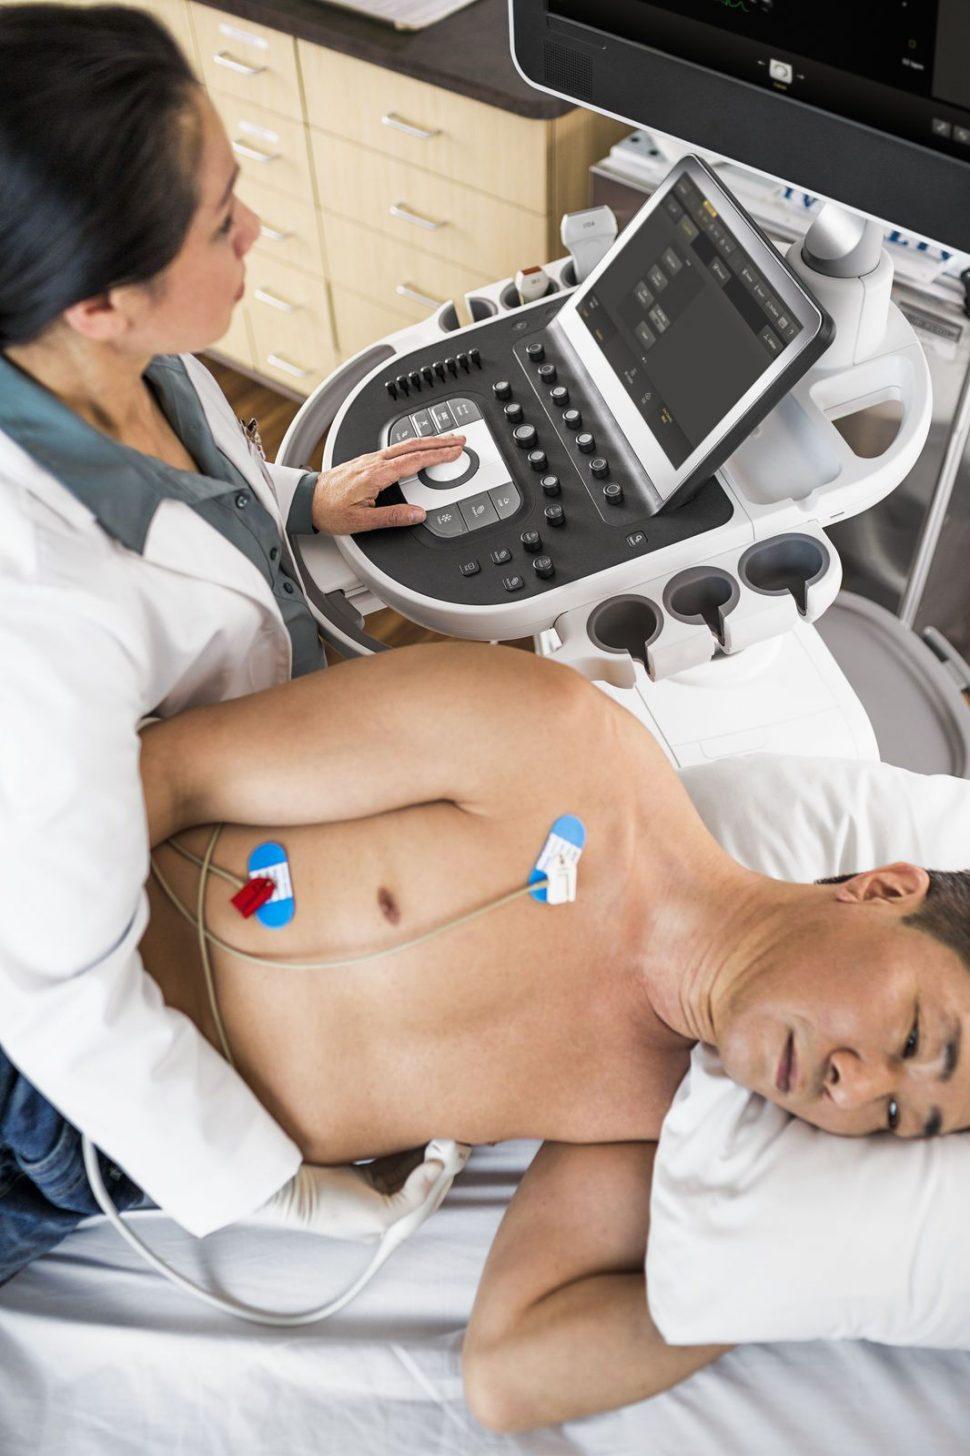 Kardiologia Philips Affiniti 50 CV 2554